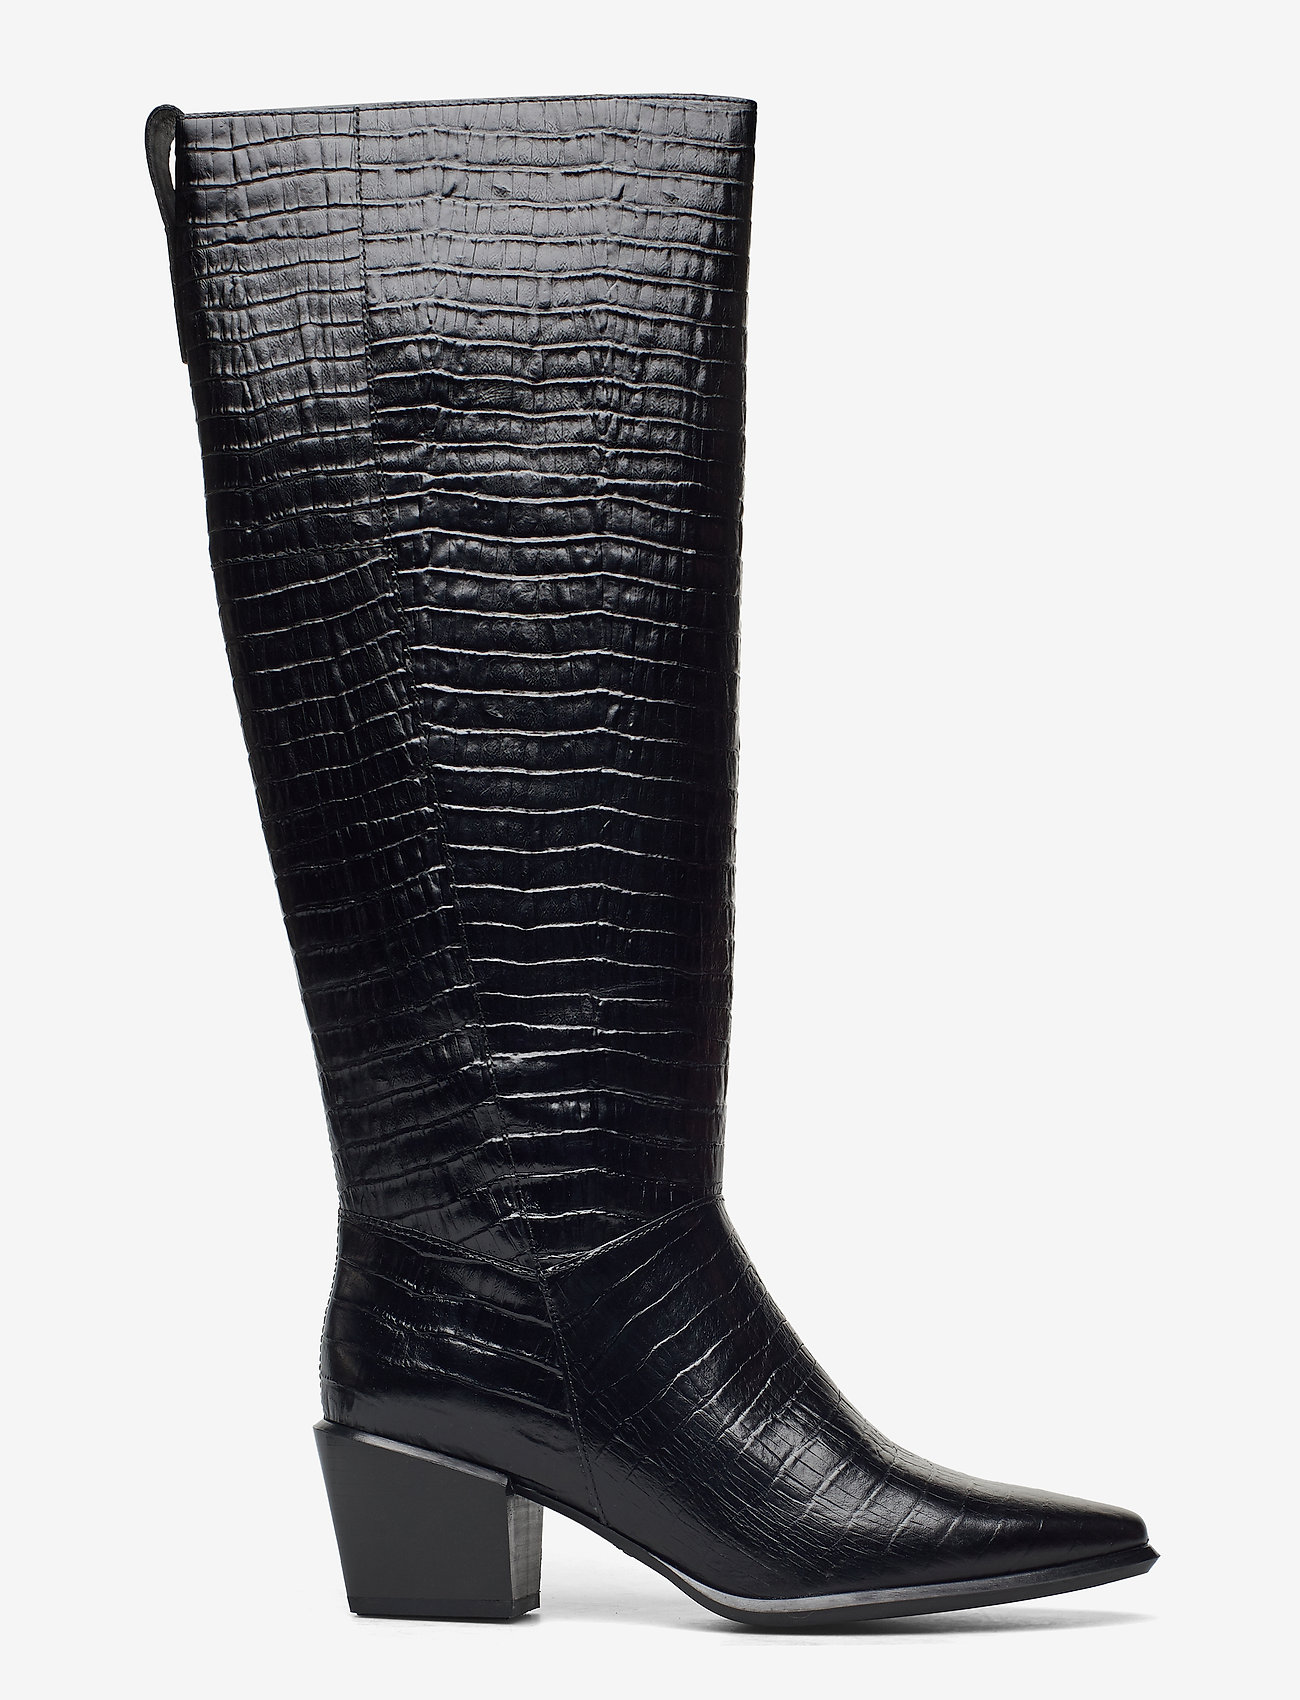 VAGABOND - BETSY - lange laarzen - black - 1